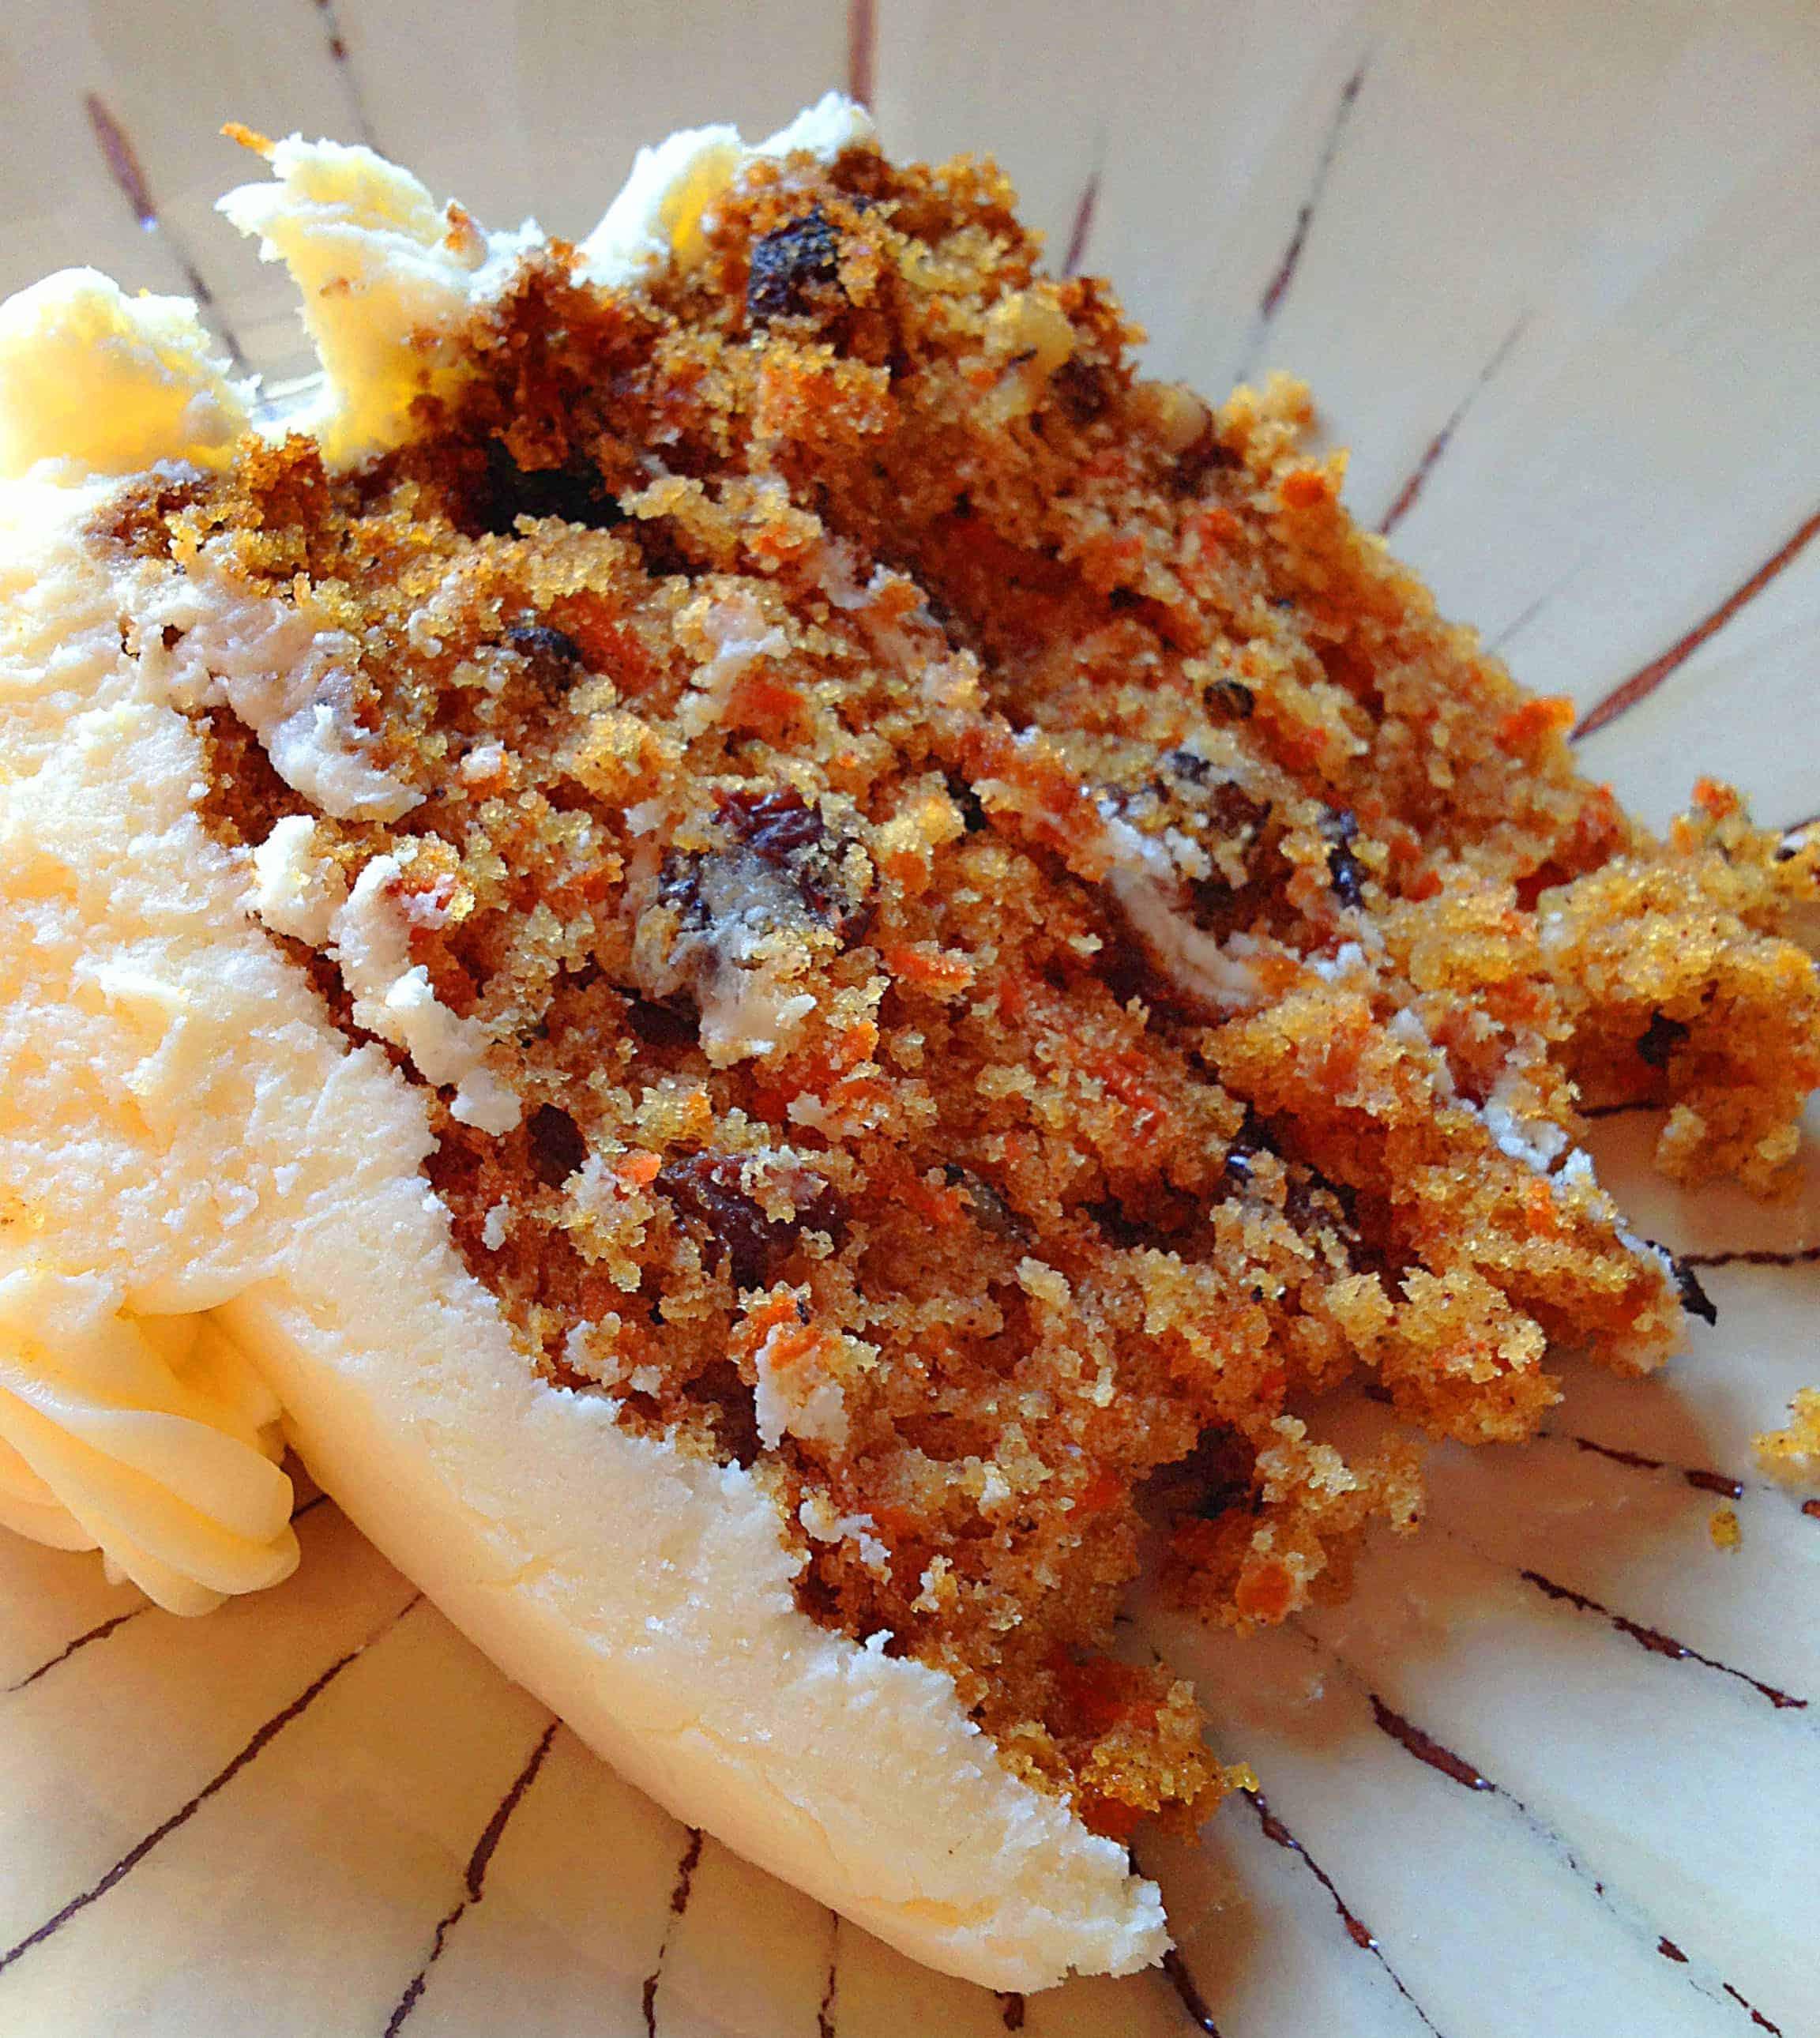 Carrot Cake Recipes  Homemade Carrot Cake Recipe Cream Cheese Frosting i am